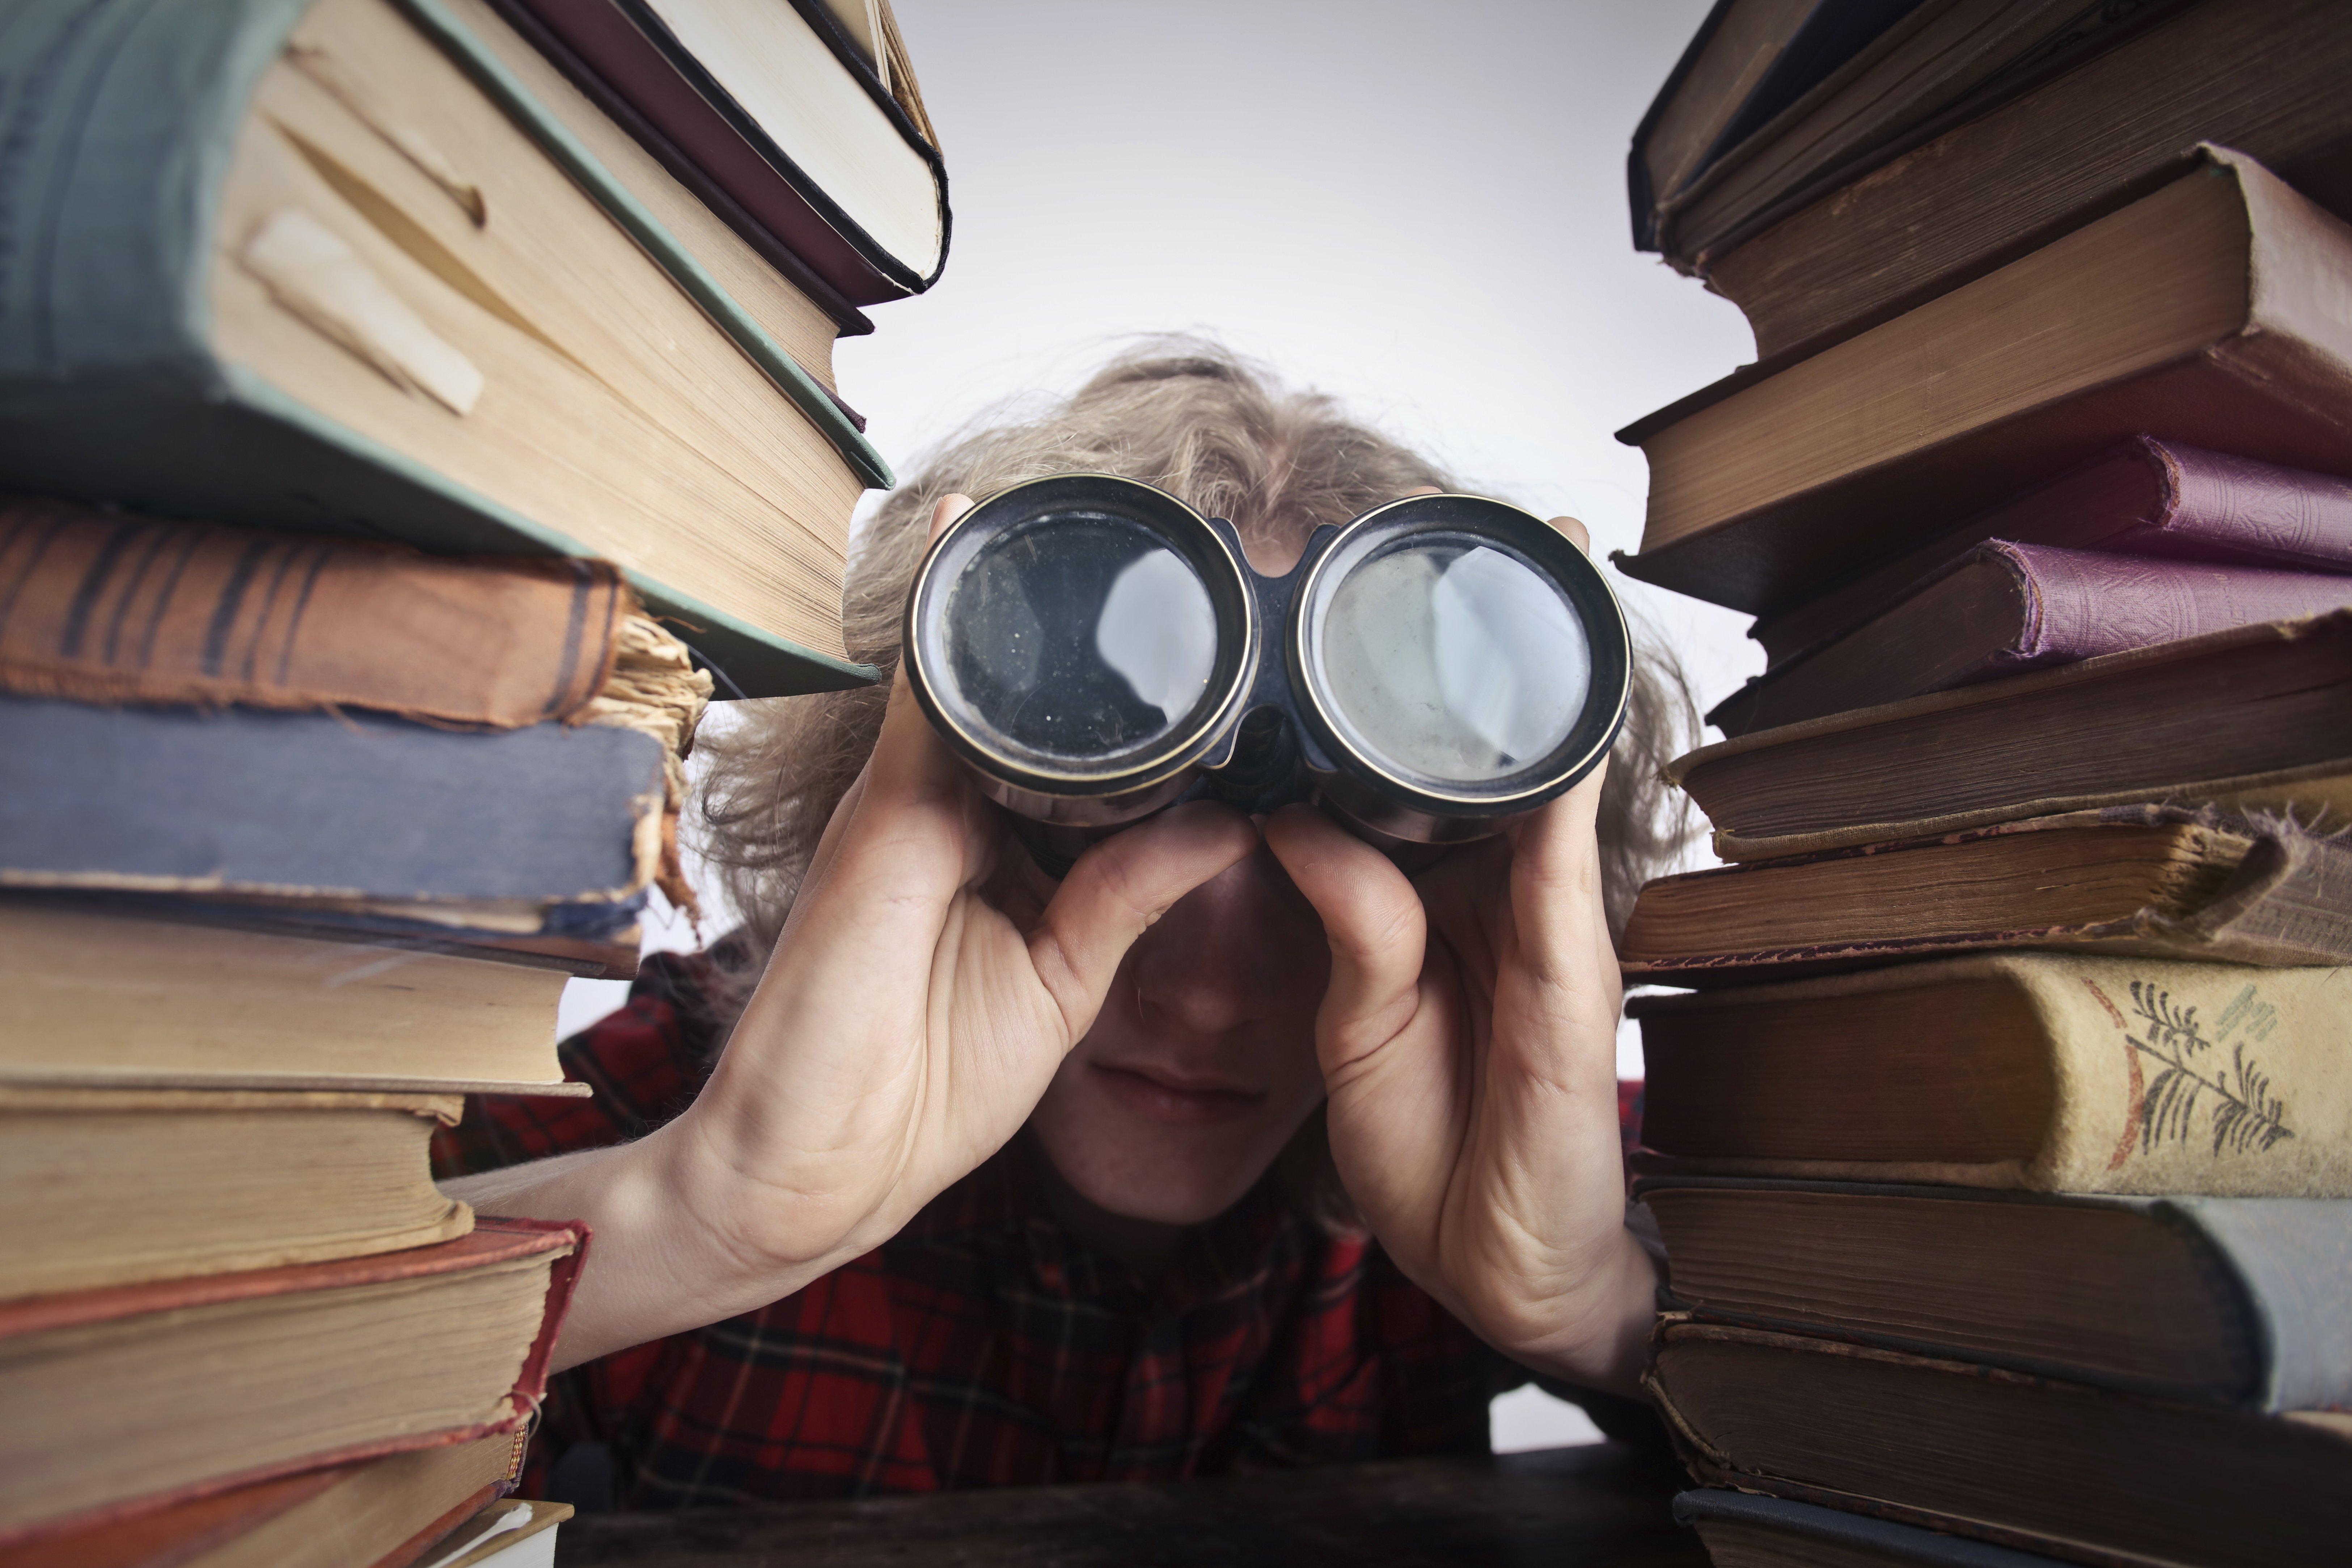 a person using binoculars